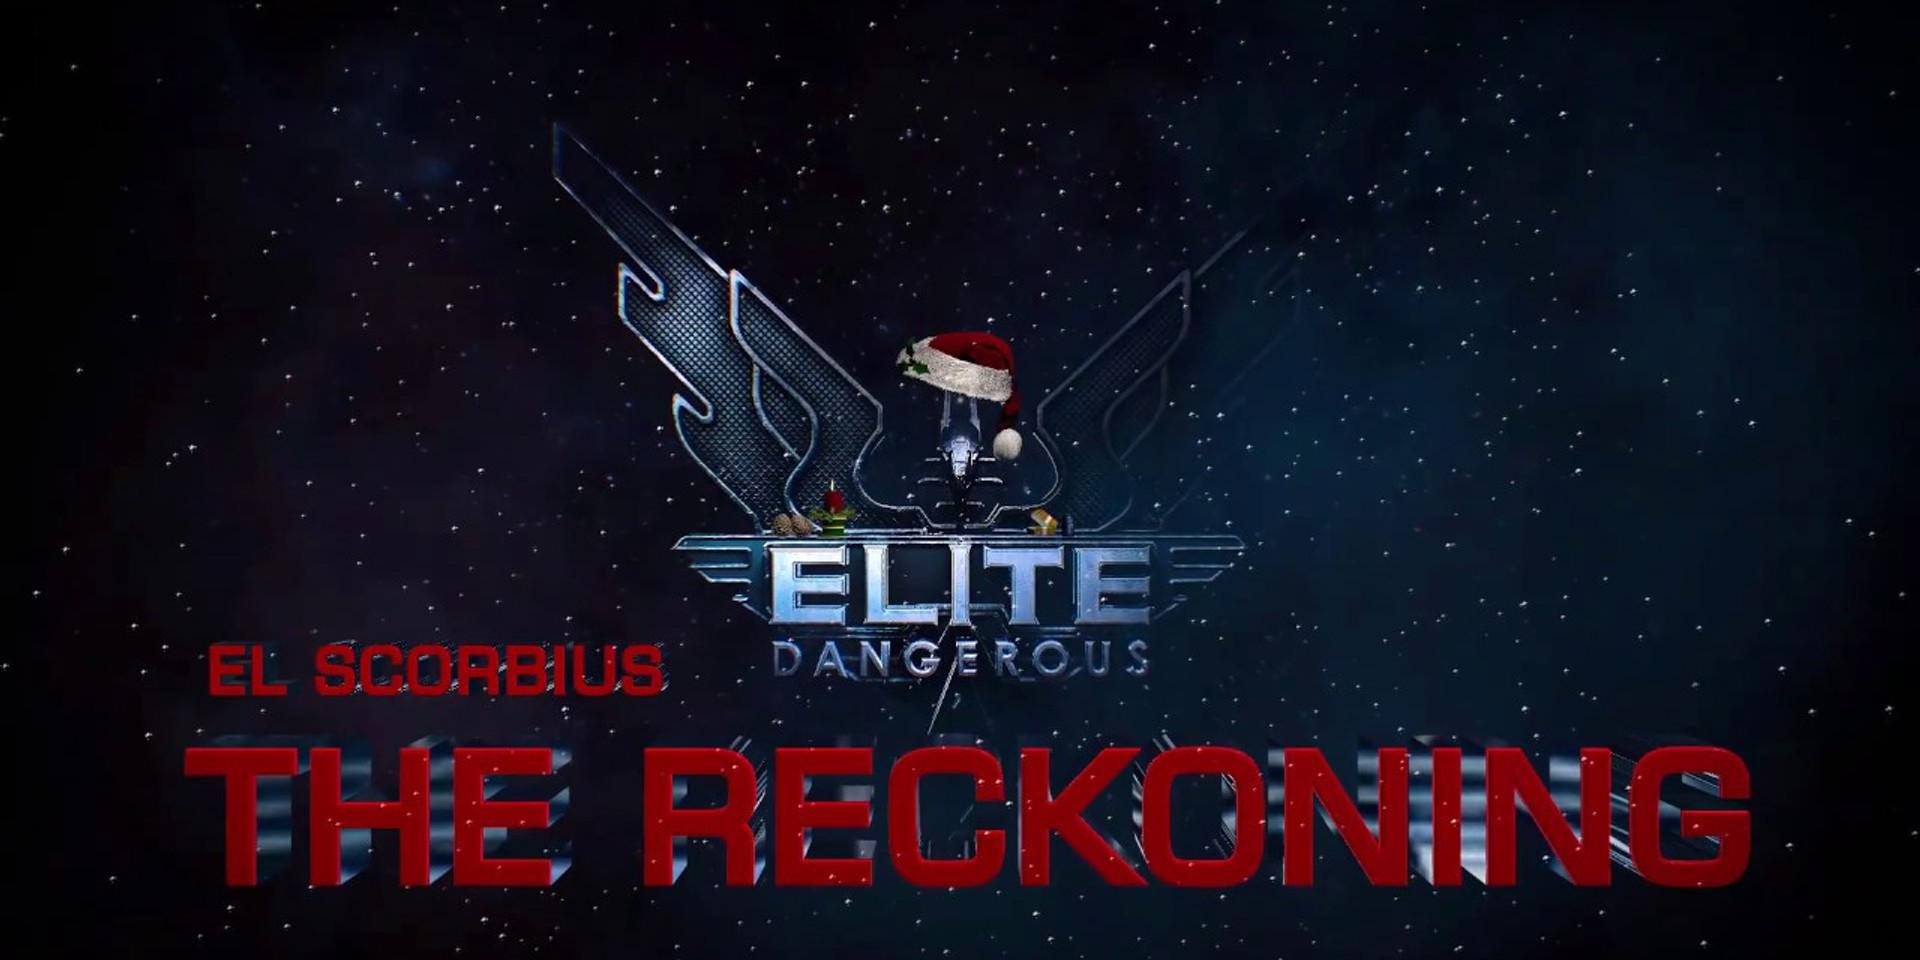 Elite: Dangerous - The Reckoning